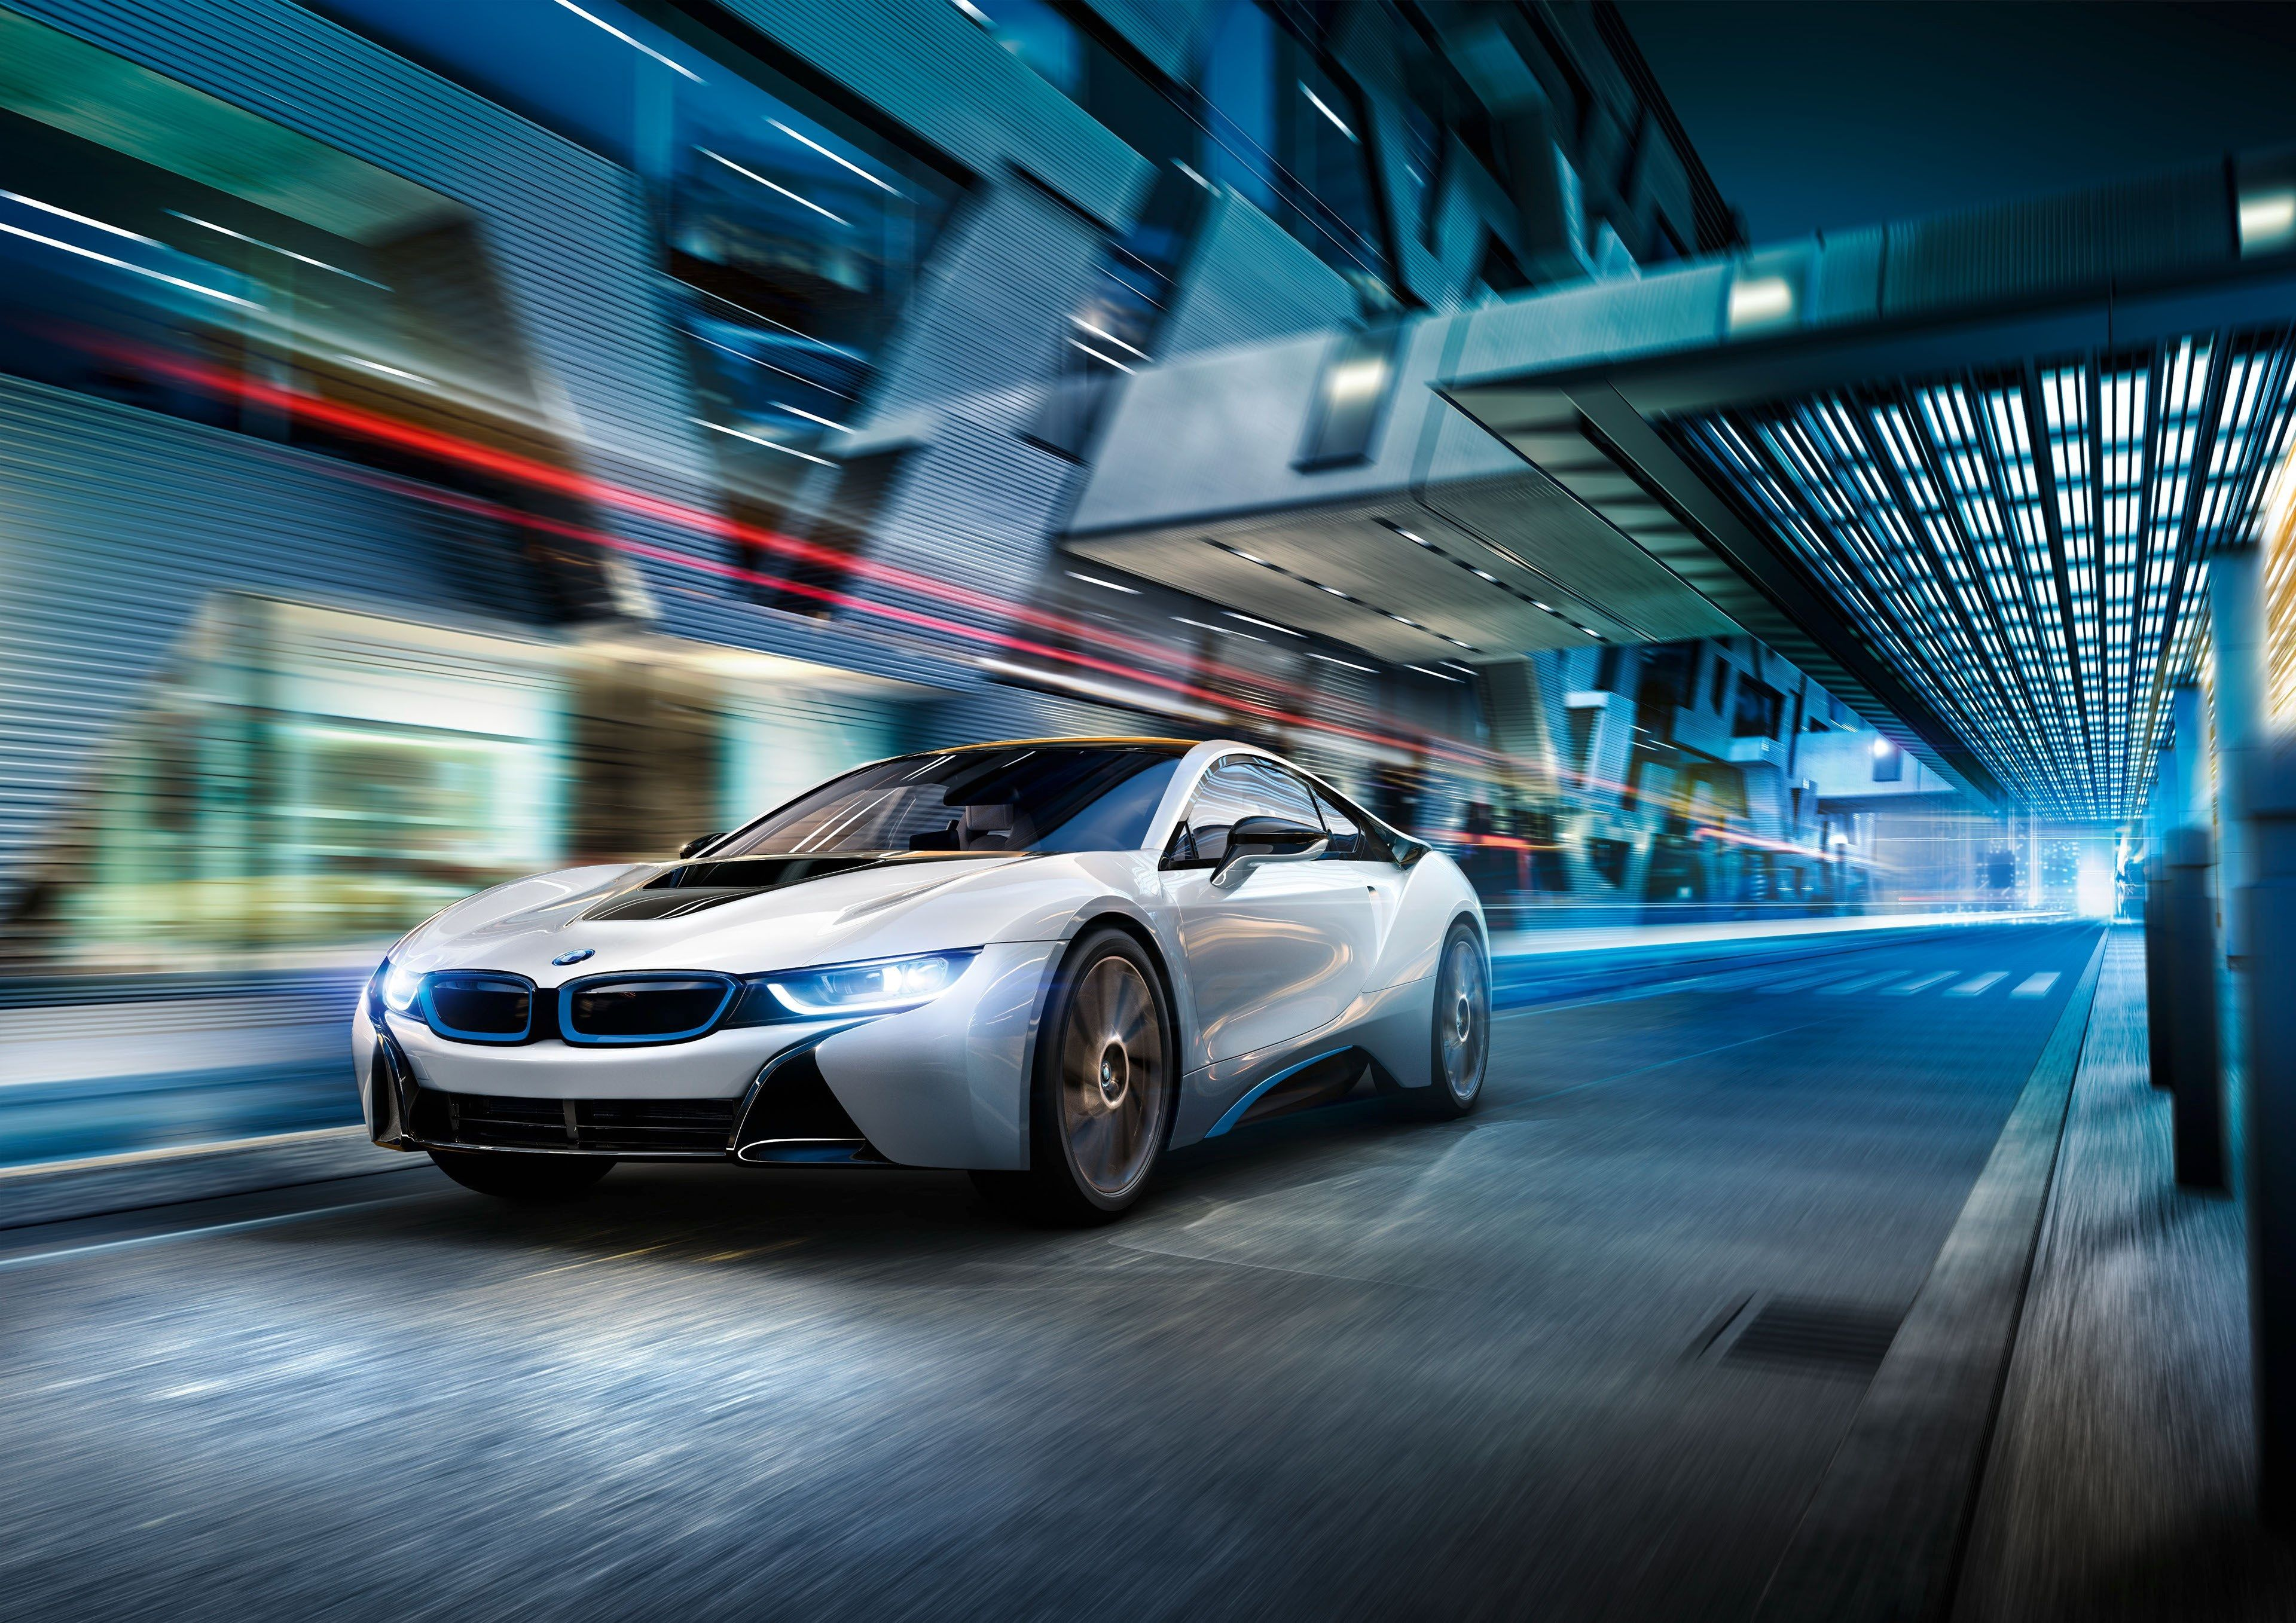 4K BMW Desktop Wallpapers - Top Free 4K BMW Desktop ...